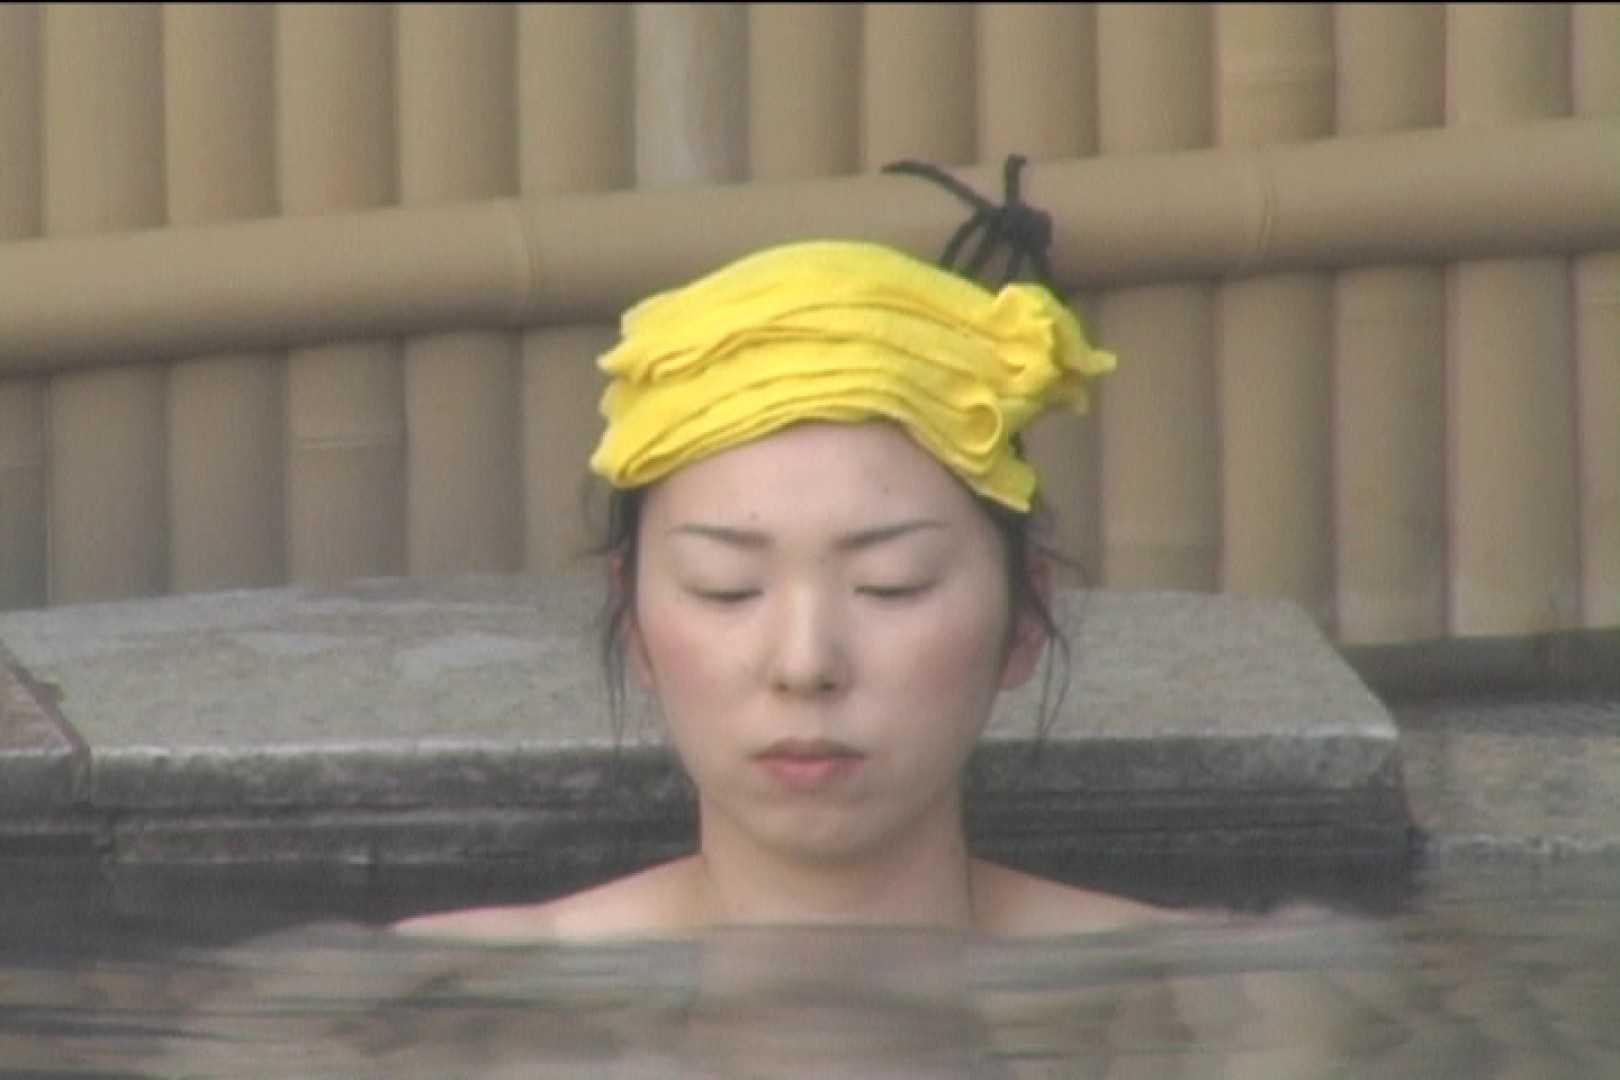 Aquaな露天風呂Vol.529 盗撮シリーズ | 露天風呂編  106PIX 45